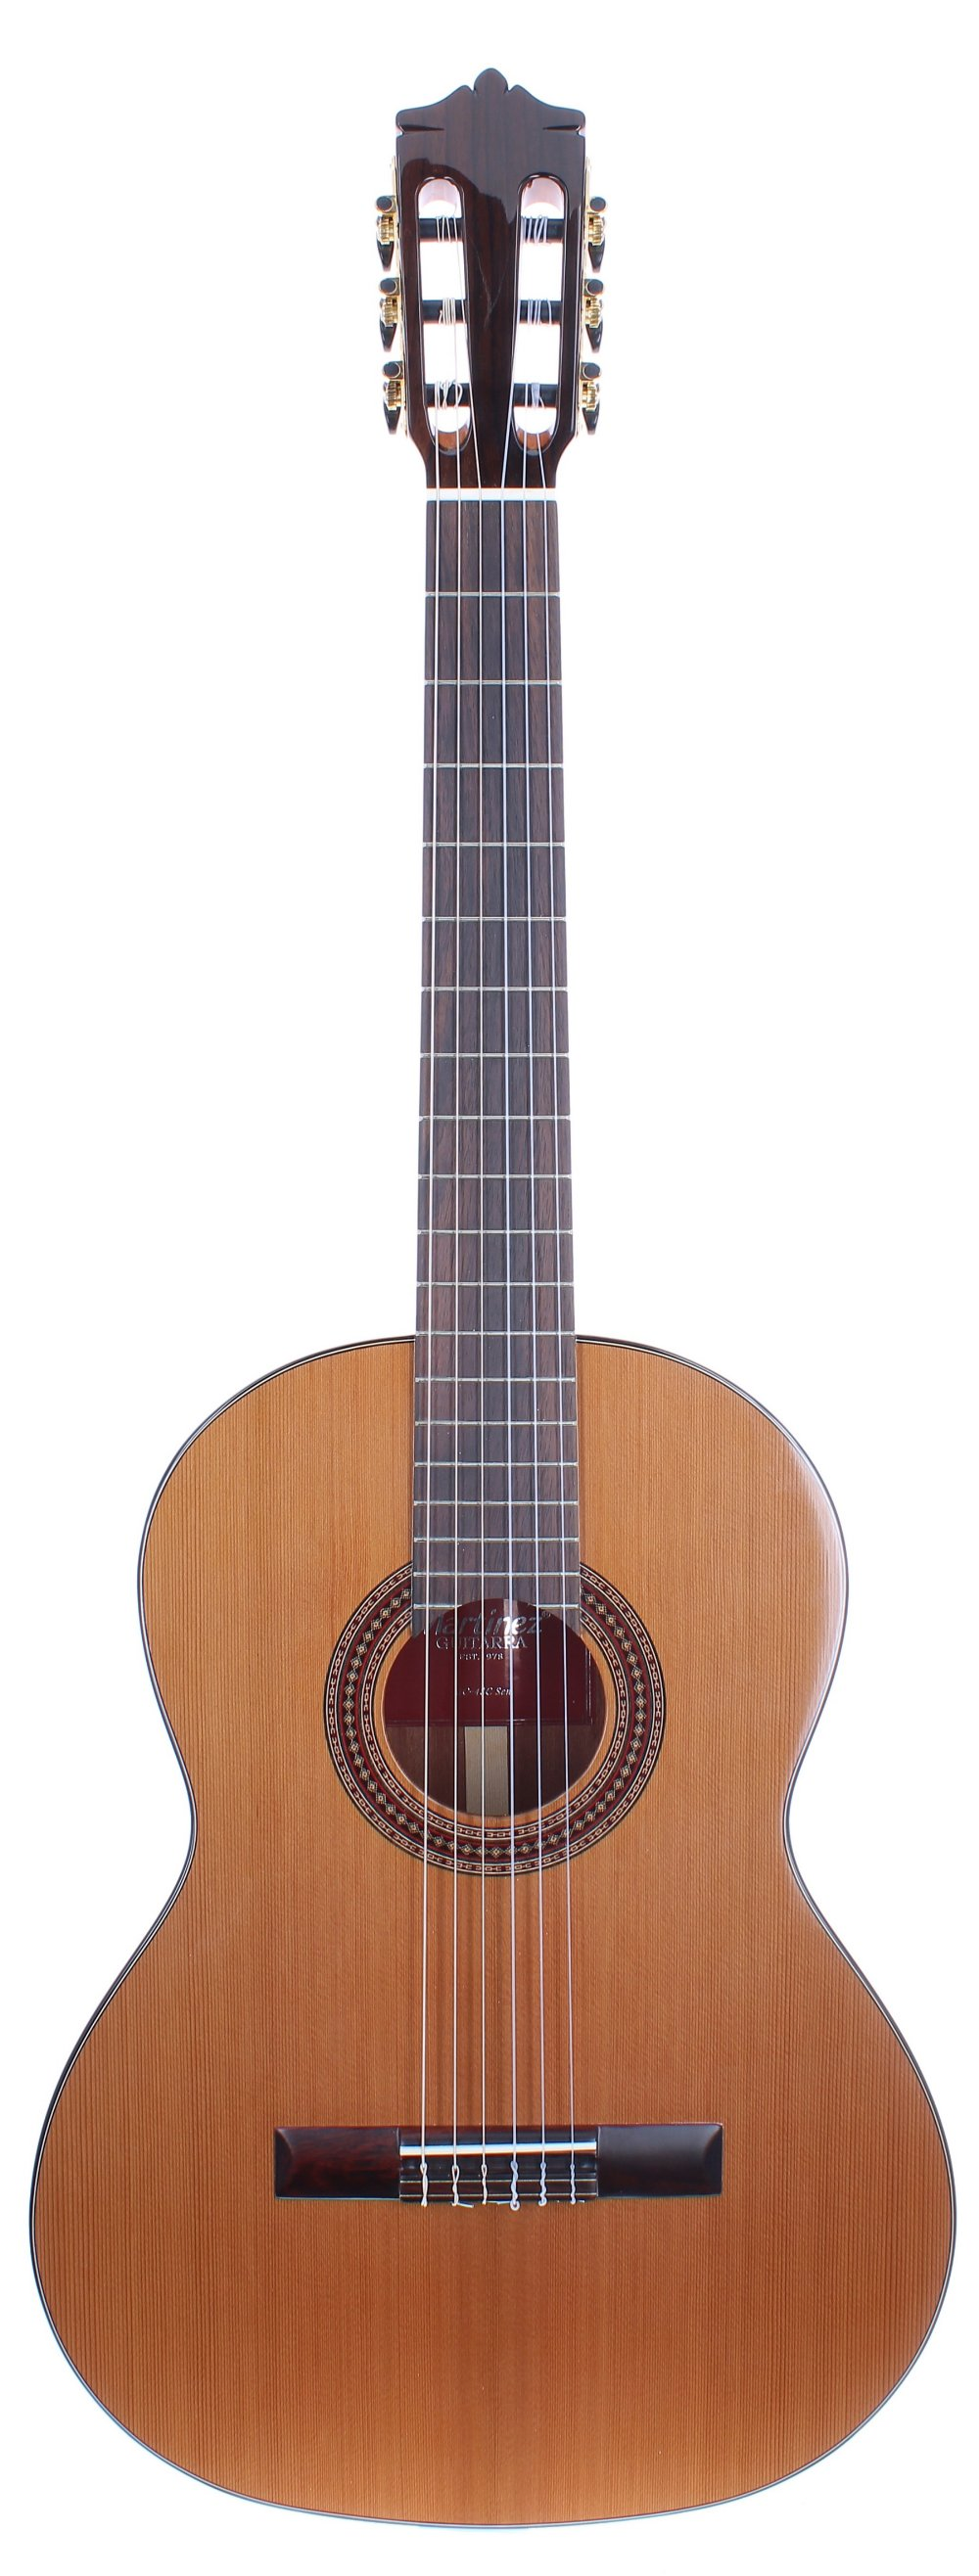 Martinez MC-48C Senorita seven-eighth size classical guitar; Back and sides: mahogany; Top: